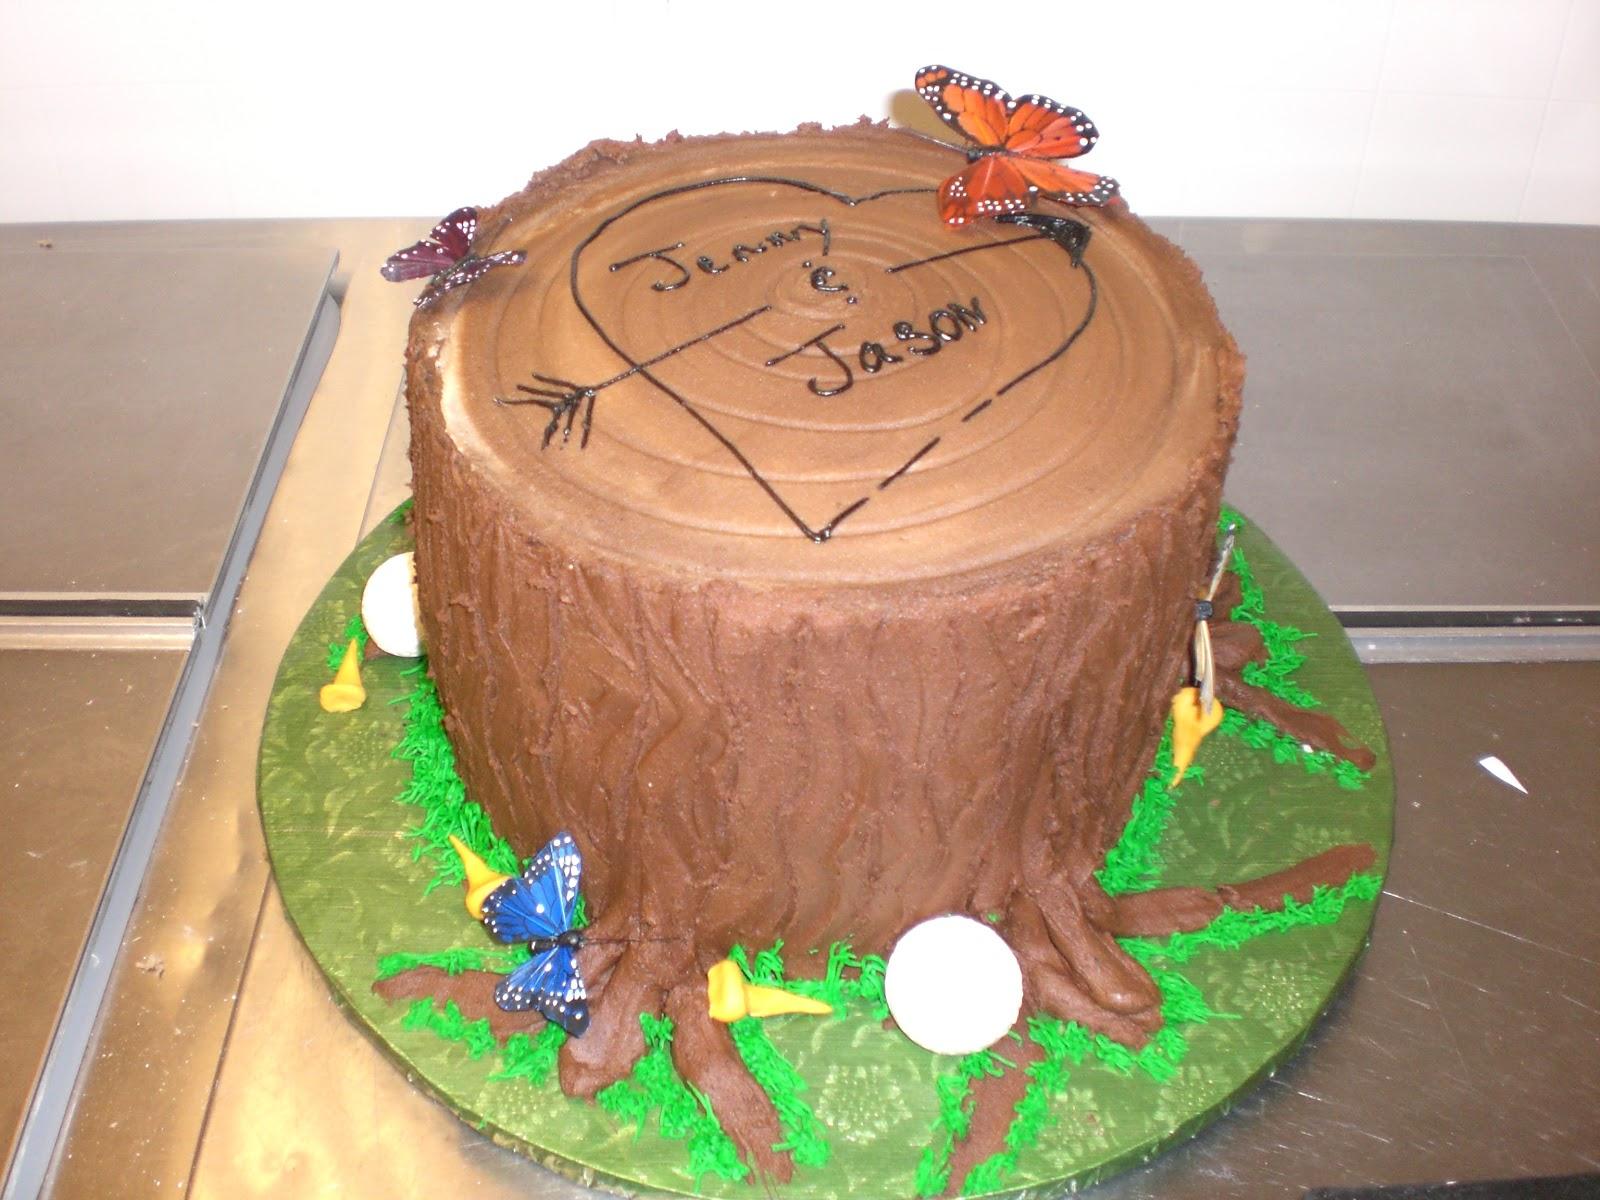 Cake Art Lawrenceville Hwy : CAFE AROMAS: Tree Stump Cake